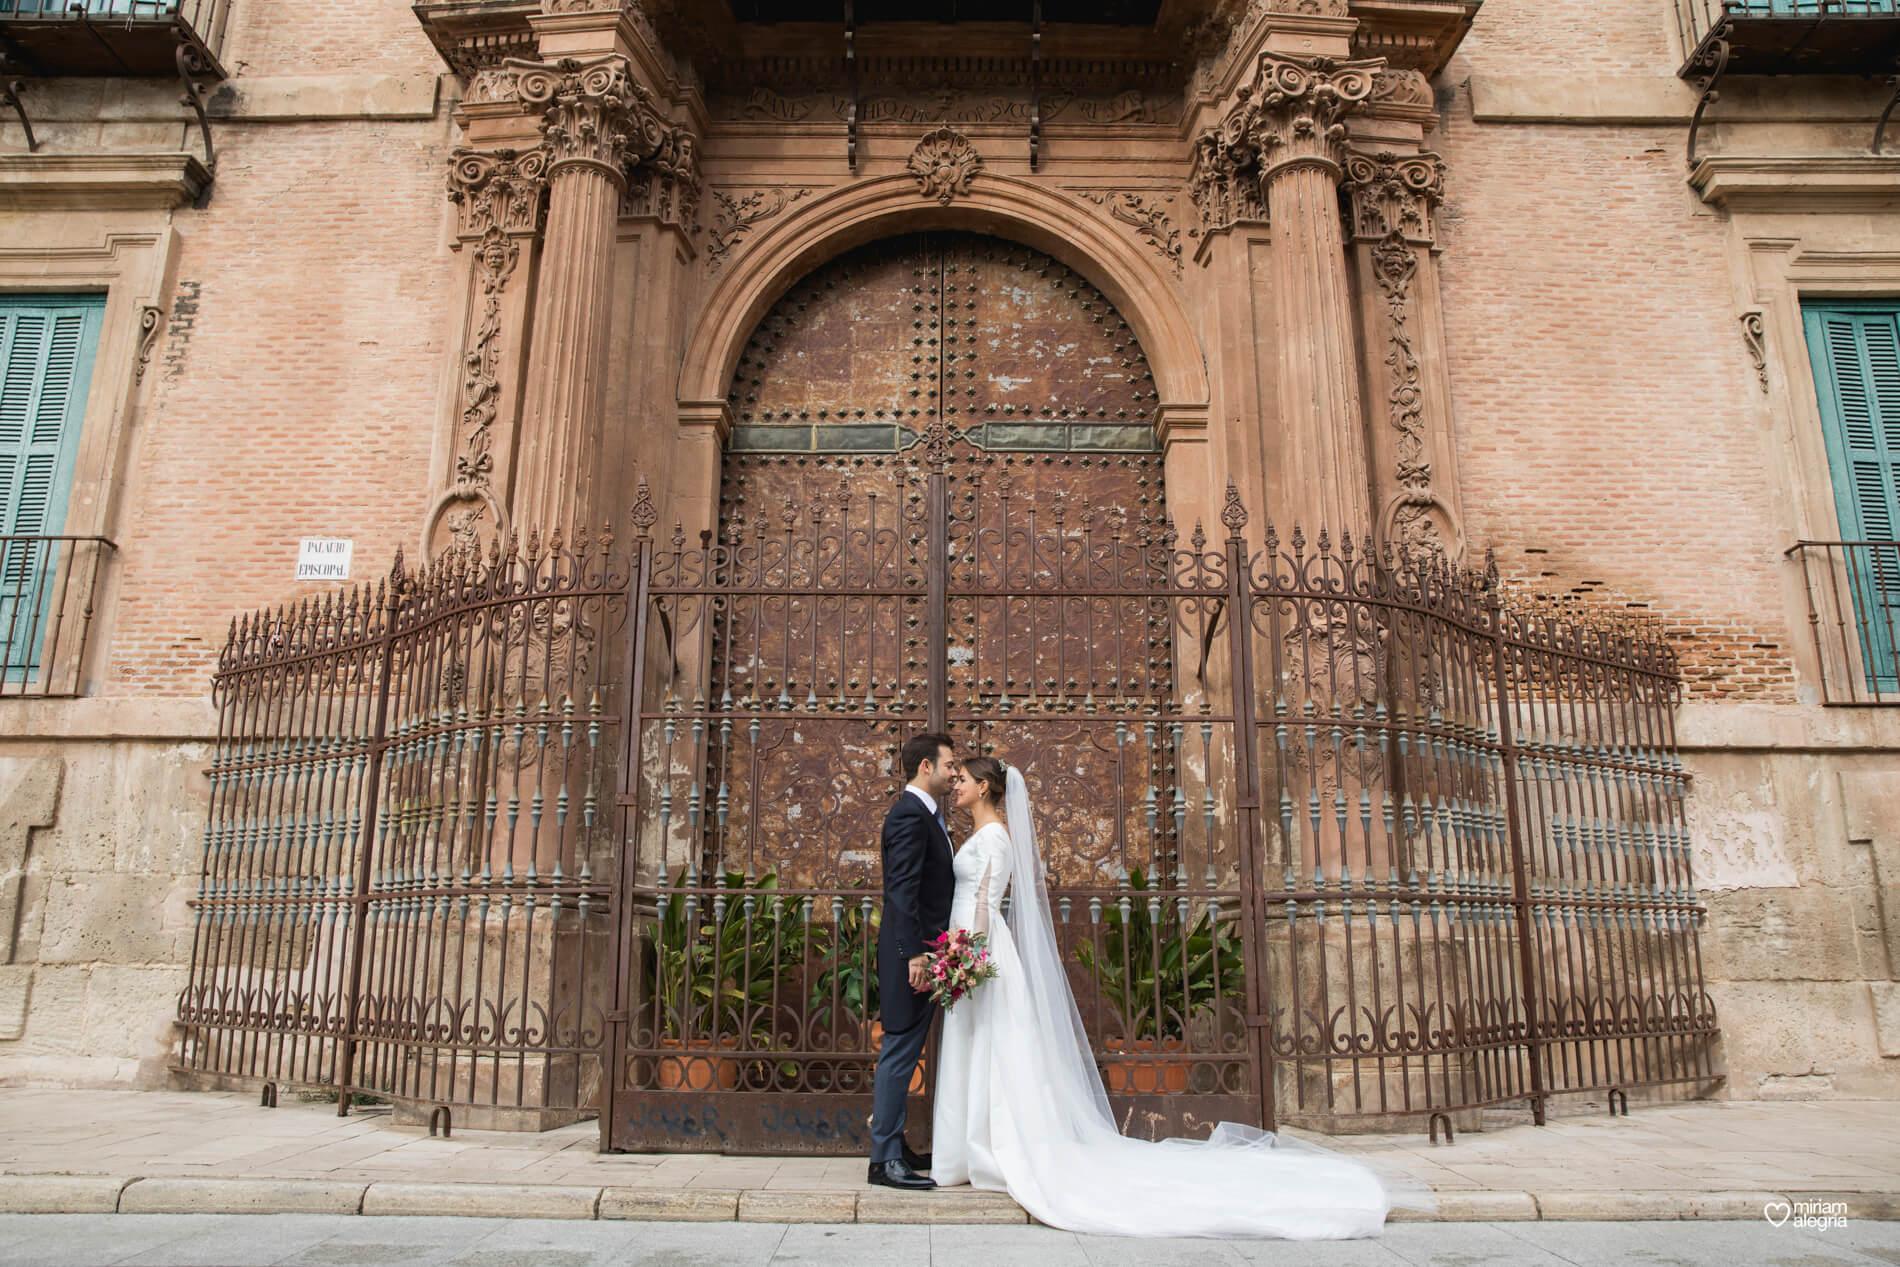 vestido-de-novia-paula-del-vas-miriam-alegria-fotografos-boda-murcia-81